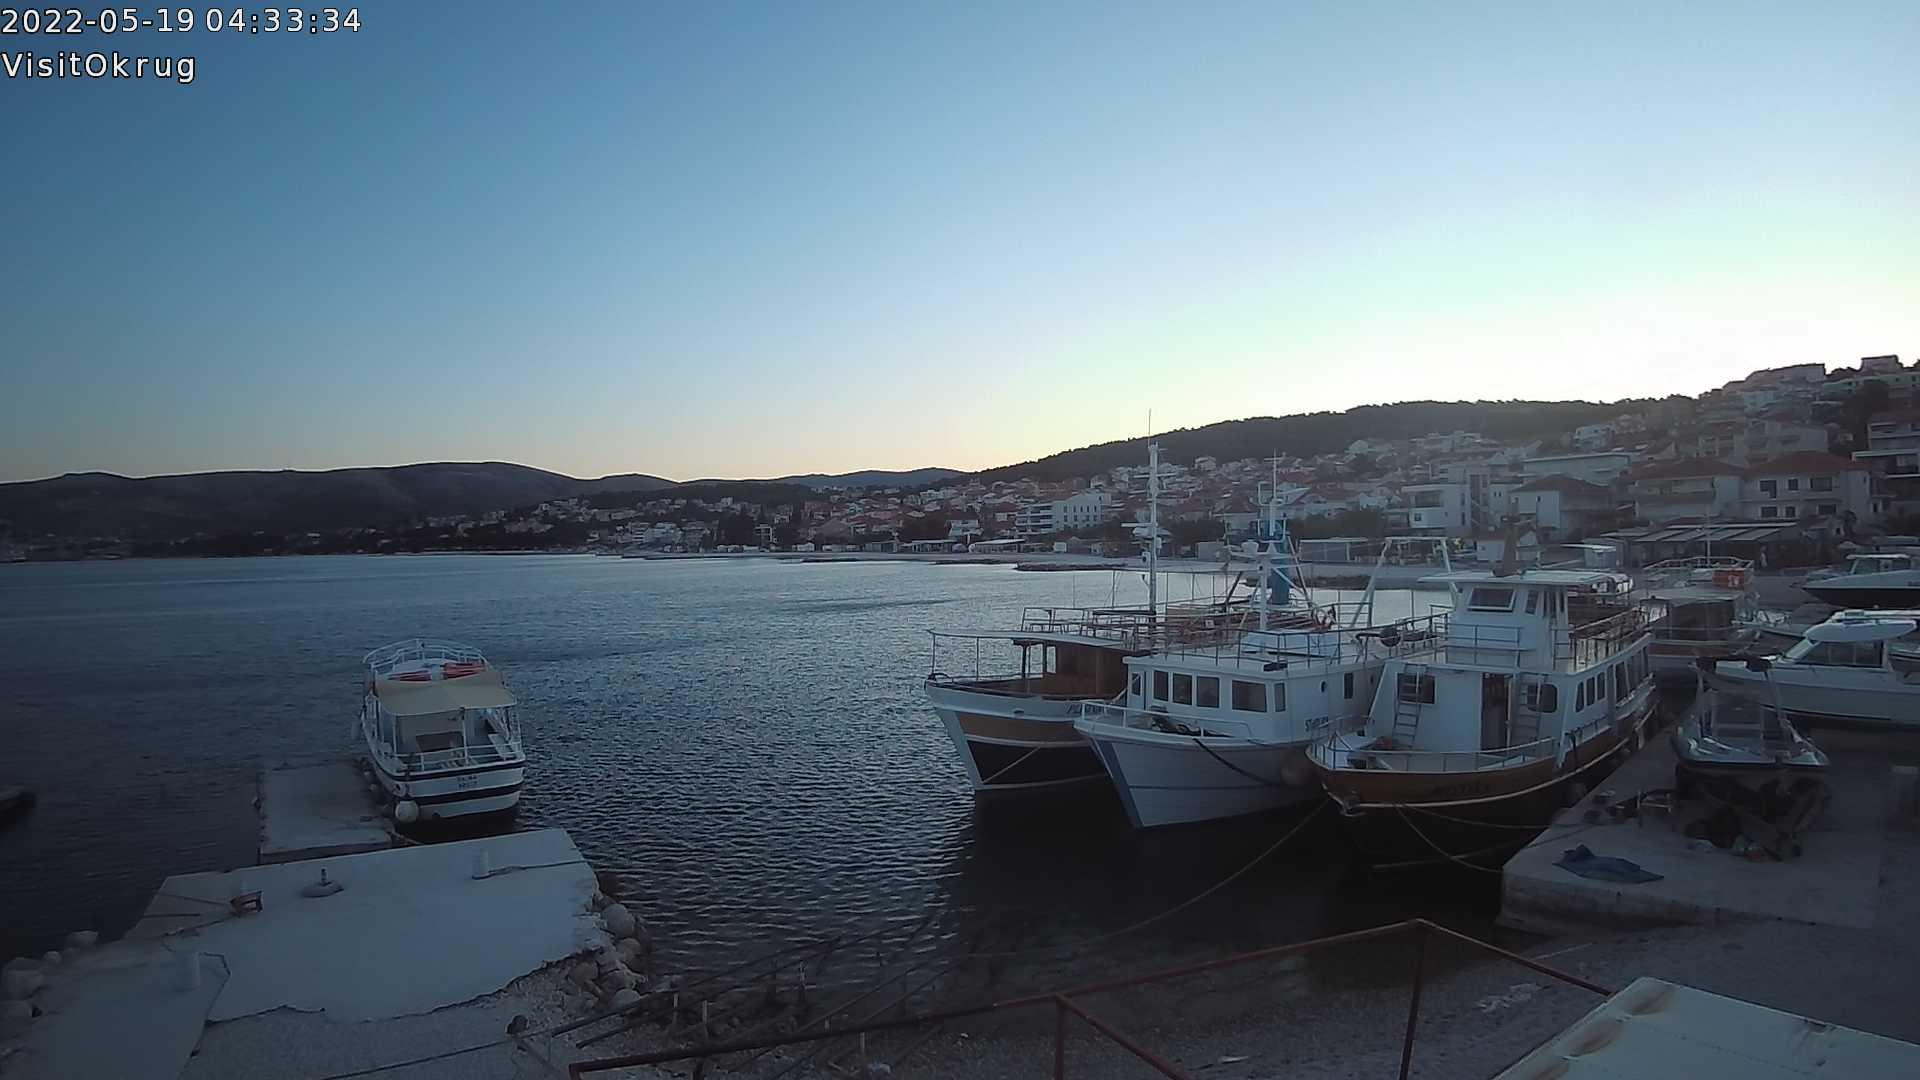 Webcam - Okrug Gornji